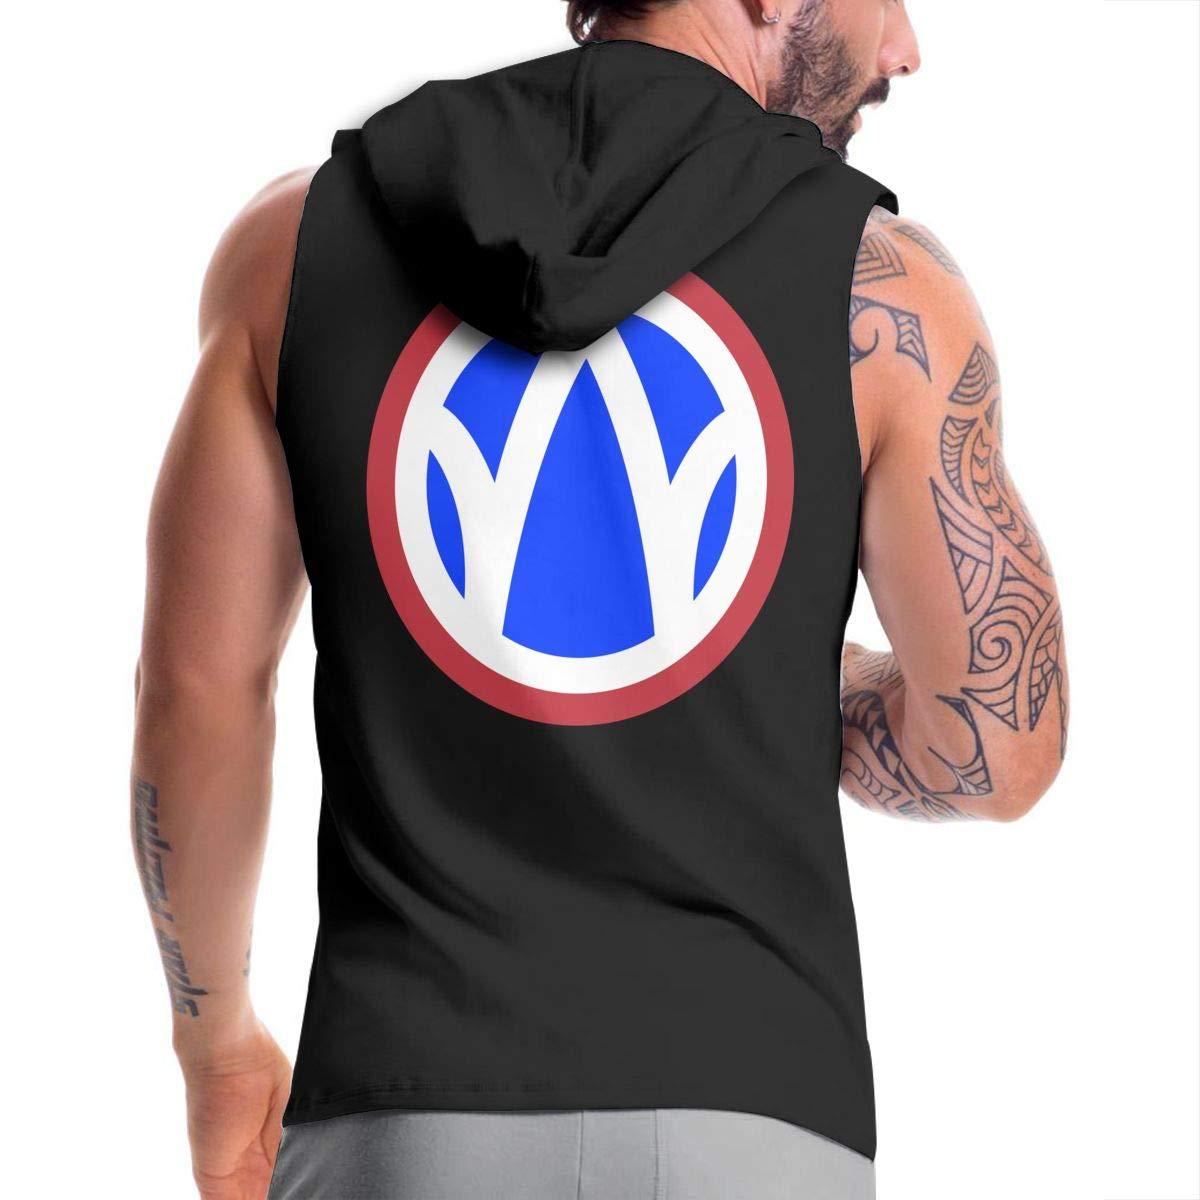 89th Infantry Brigade Mens Hipster Hip Hop Hoodies Shirts